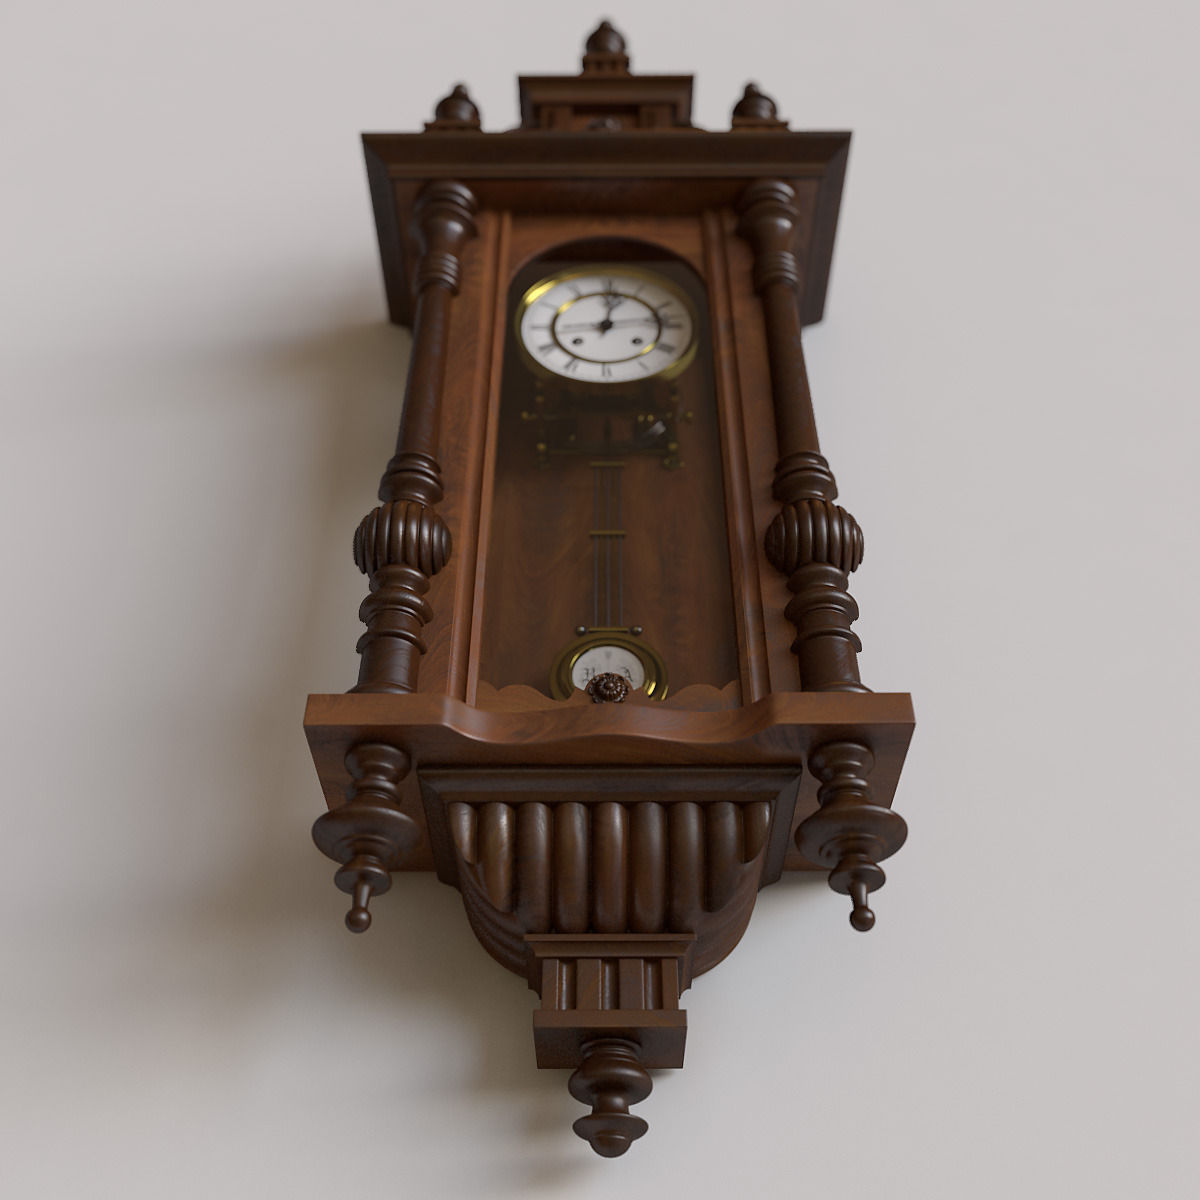 Antique pendulum wall clock 3d cgtrader antique pendulum wall clock 3d model max obj 4 amipublicfo Images